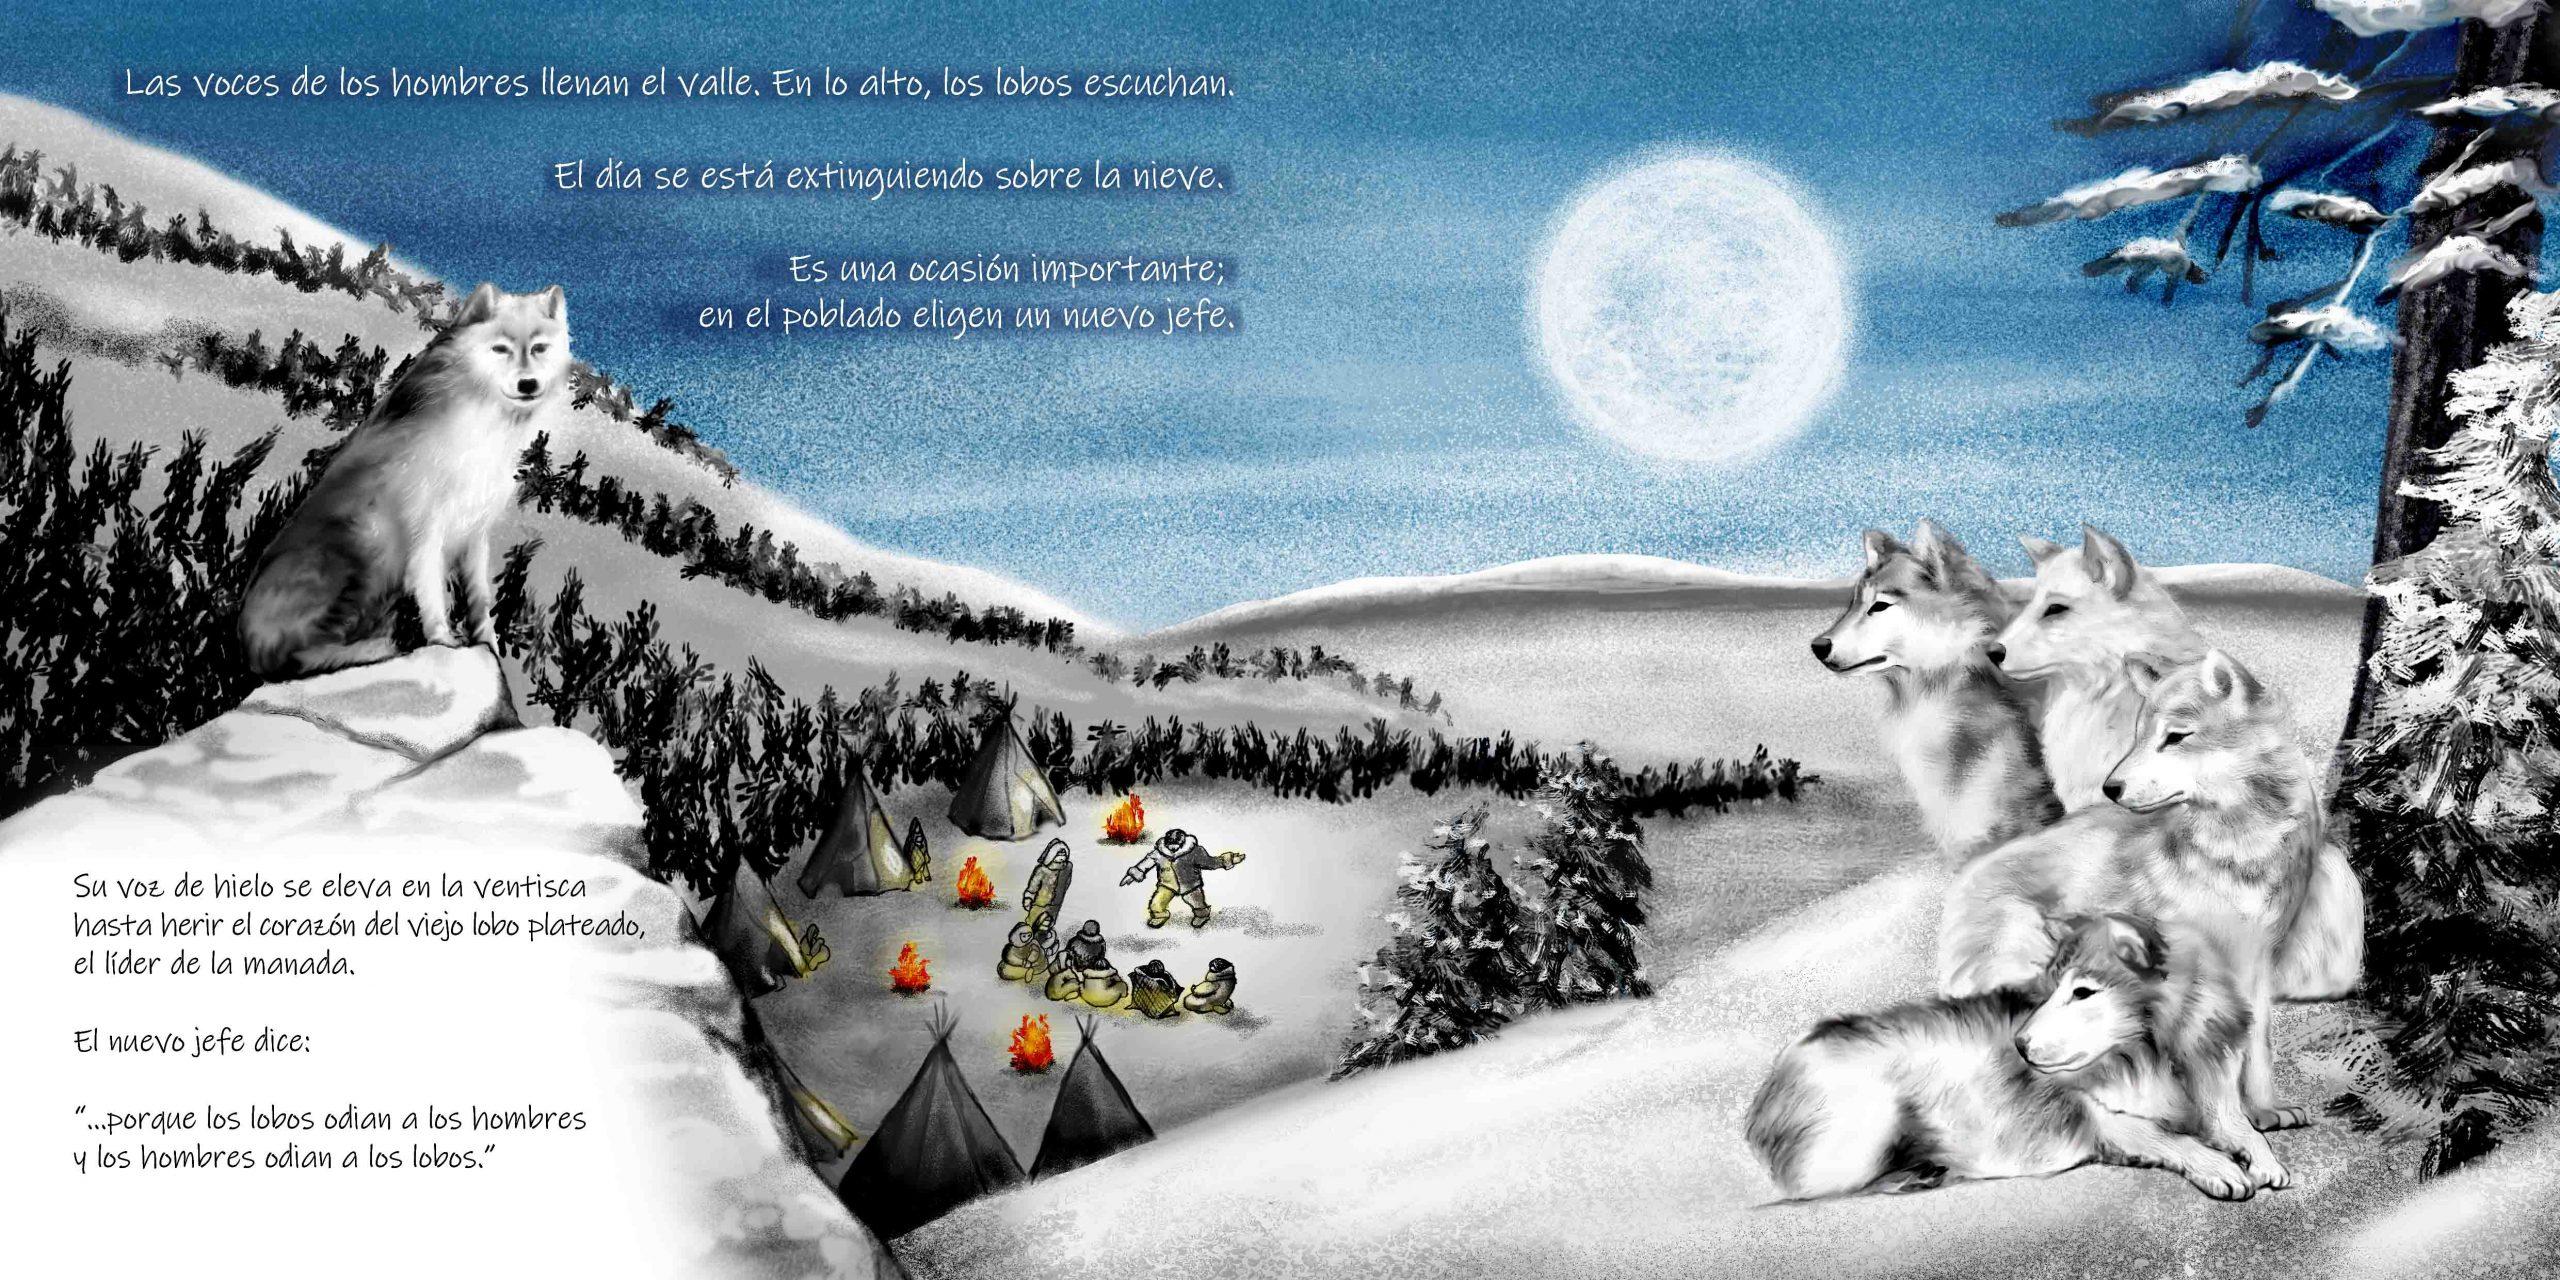 Amarok Illustrated Album by Vivian Leila Campillo page 6_7